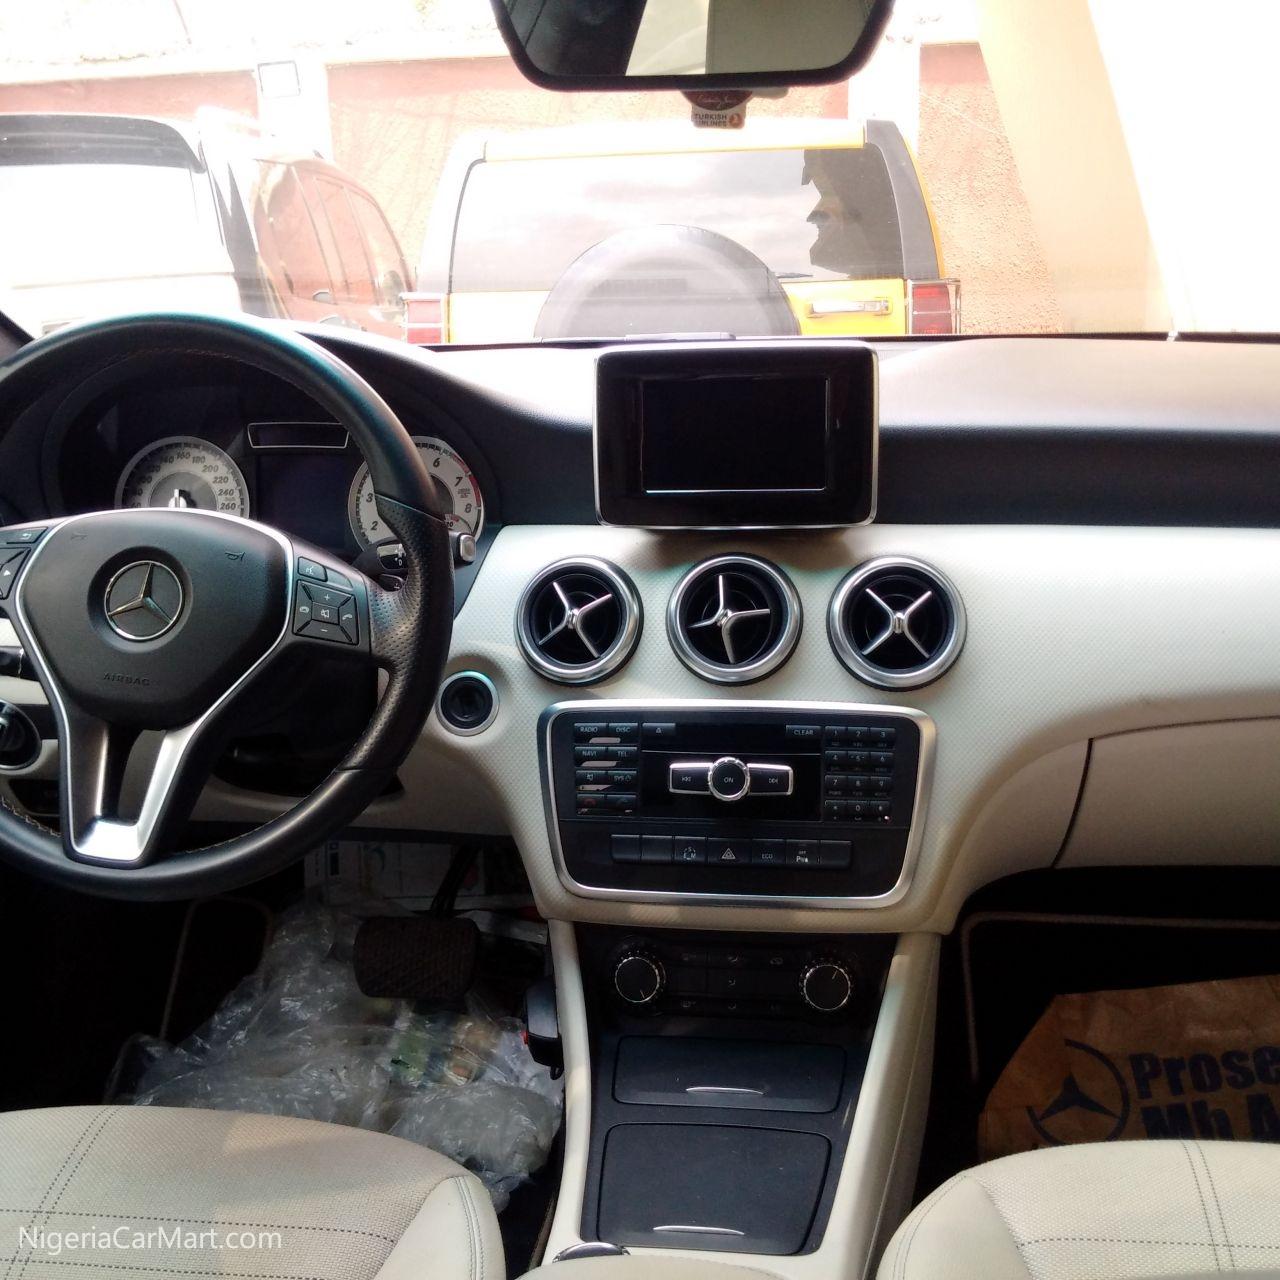 Car Mart Com >> 2015 Mercedes Benz C250 used car for sale in Lagos Nigeria ...